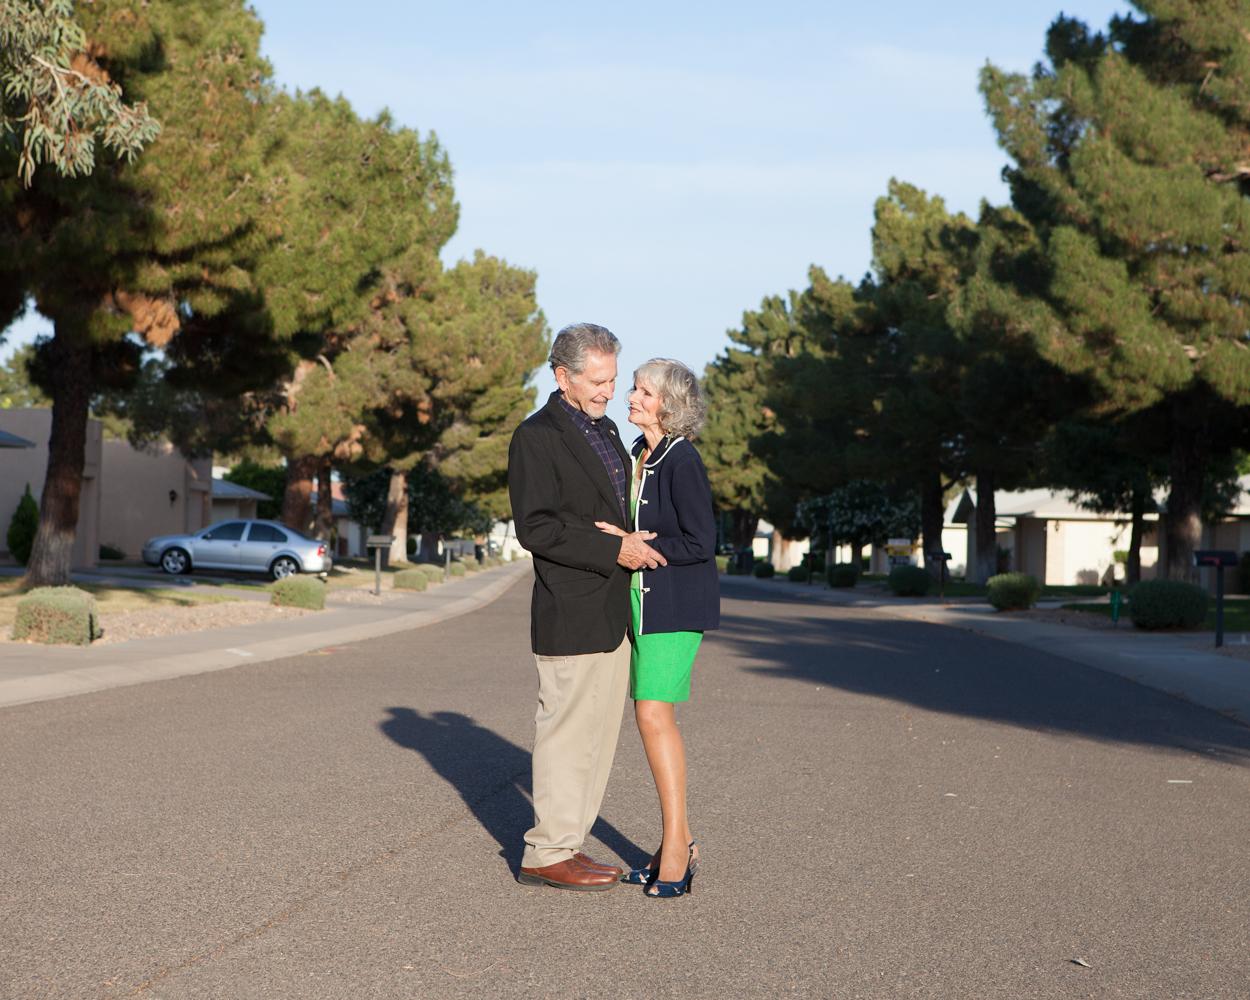 Bill Cram (80 ans) et Diane Shapiro (75 ans), Sun City West